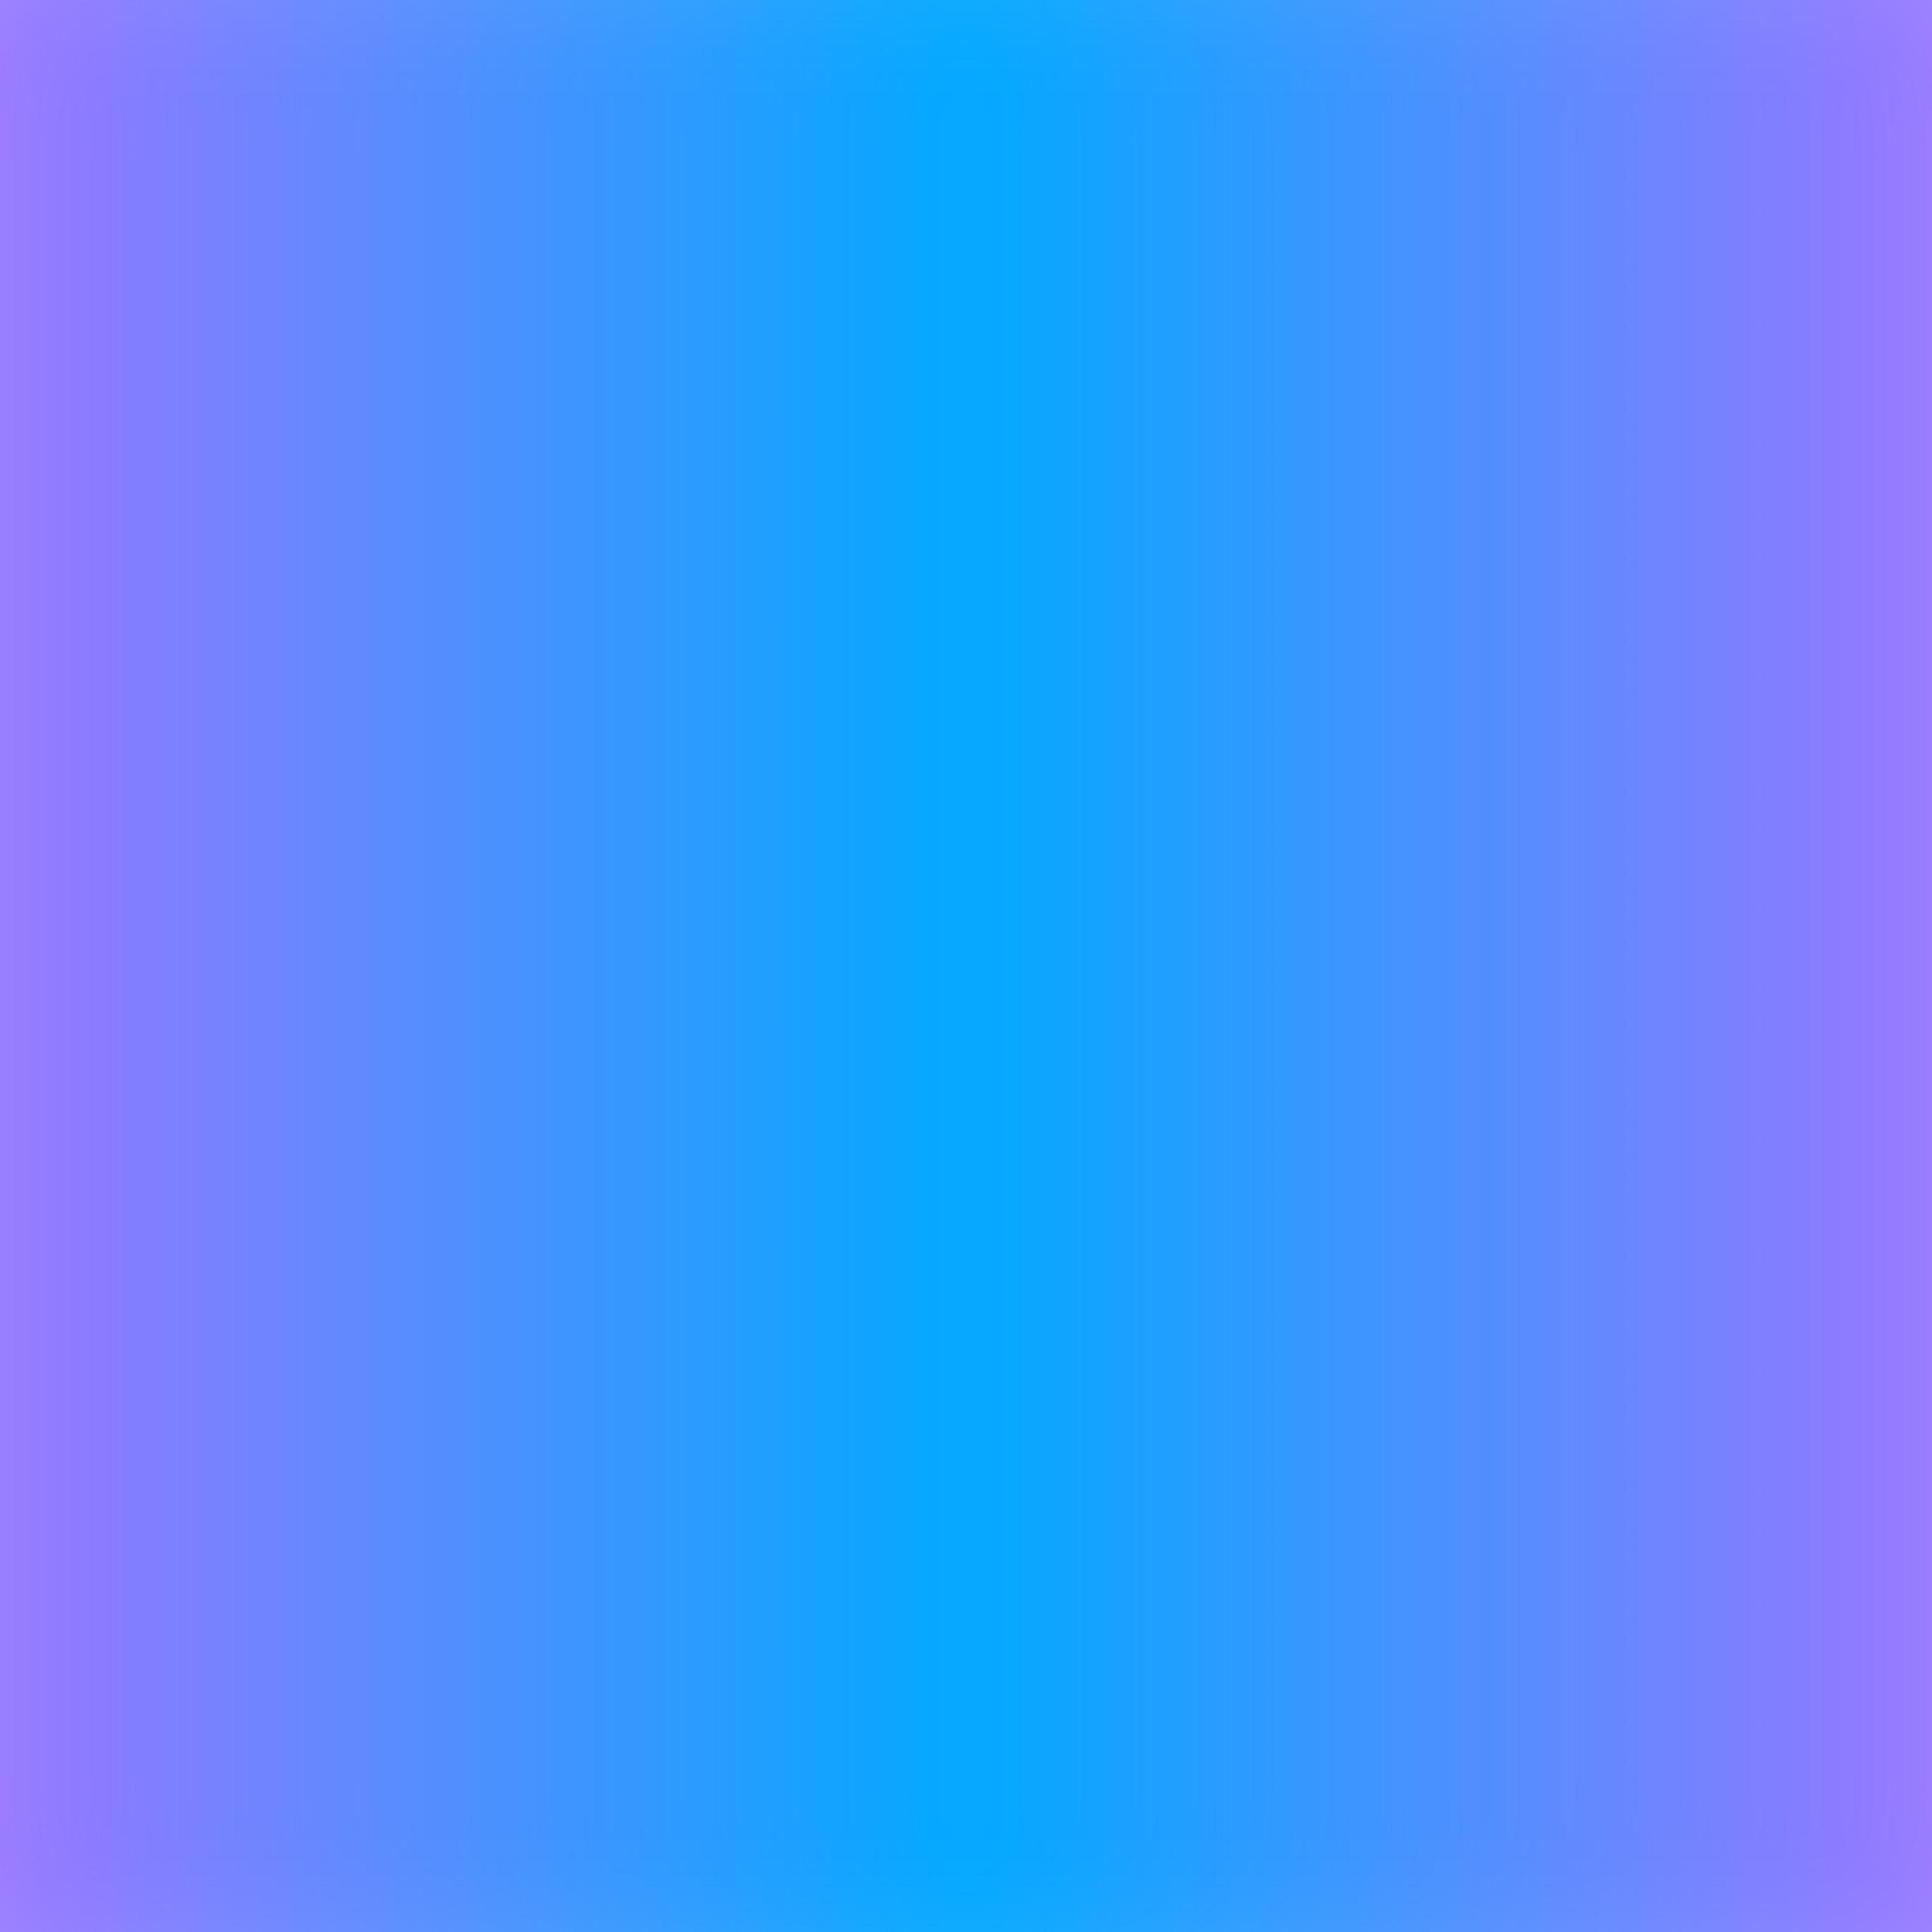 Sd16 Los Angeles Bixel St Blur Gradient